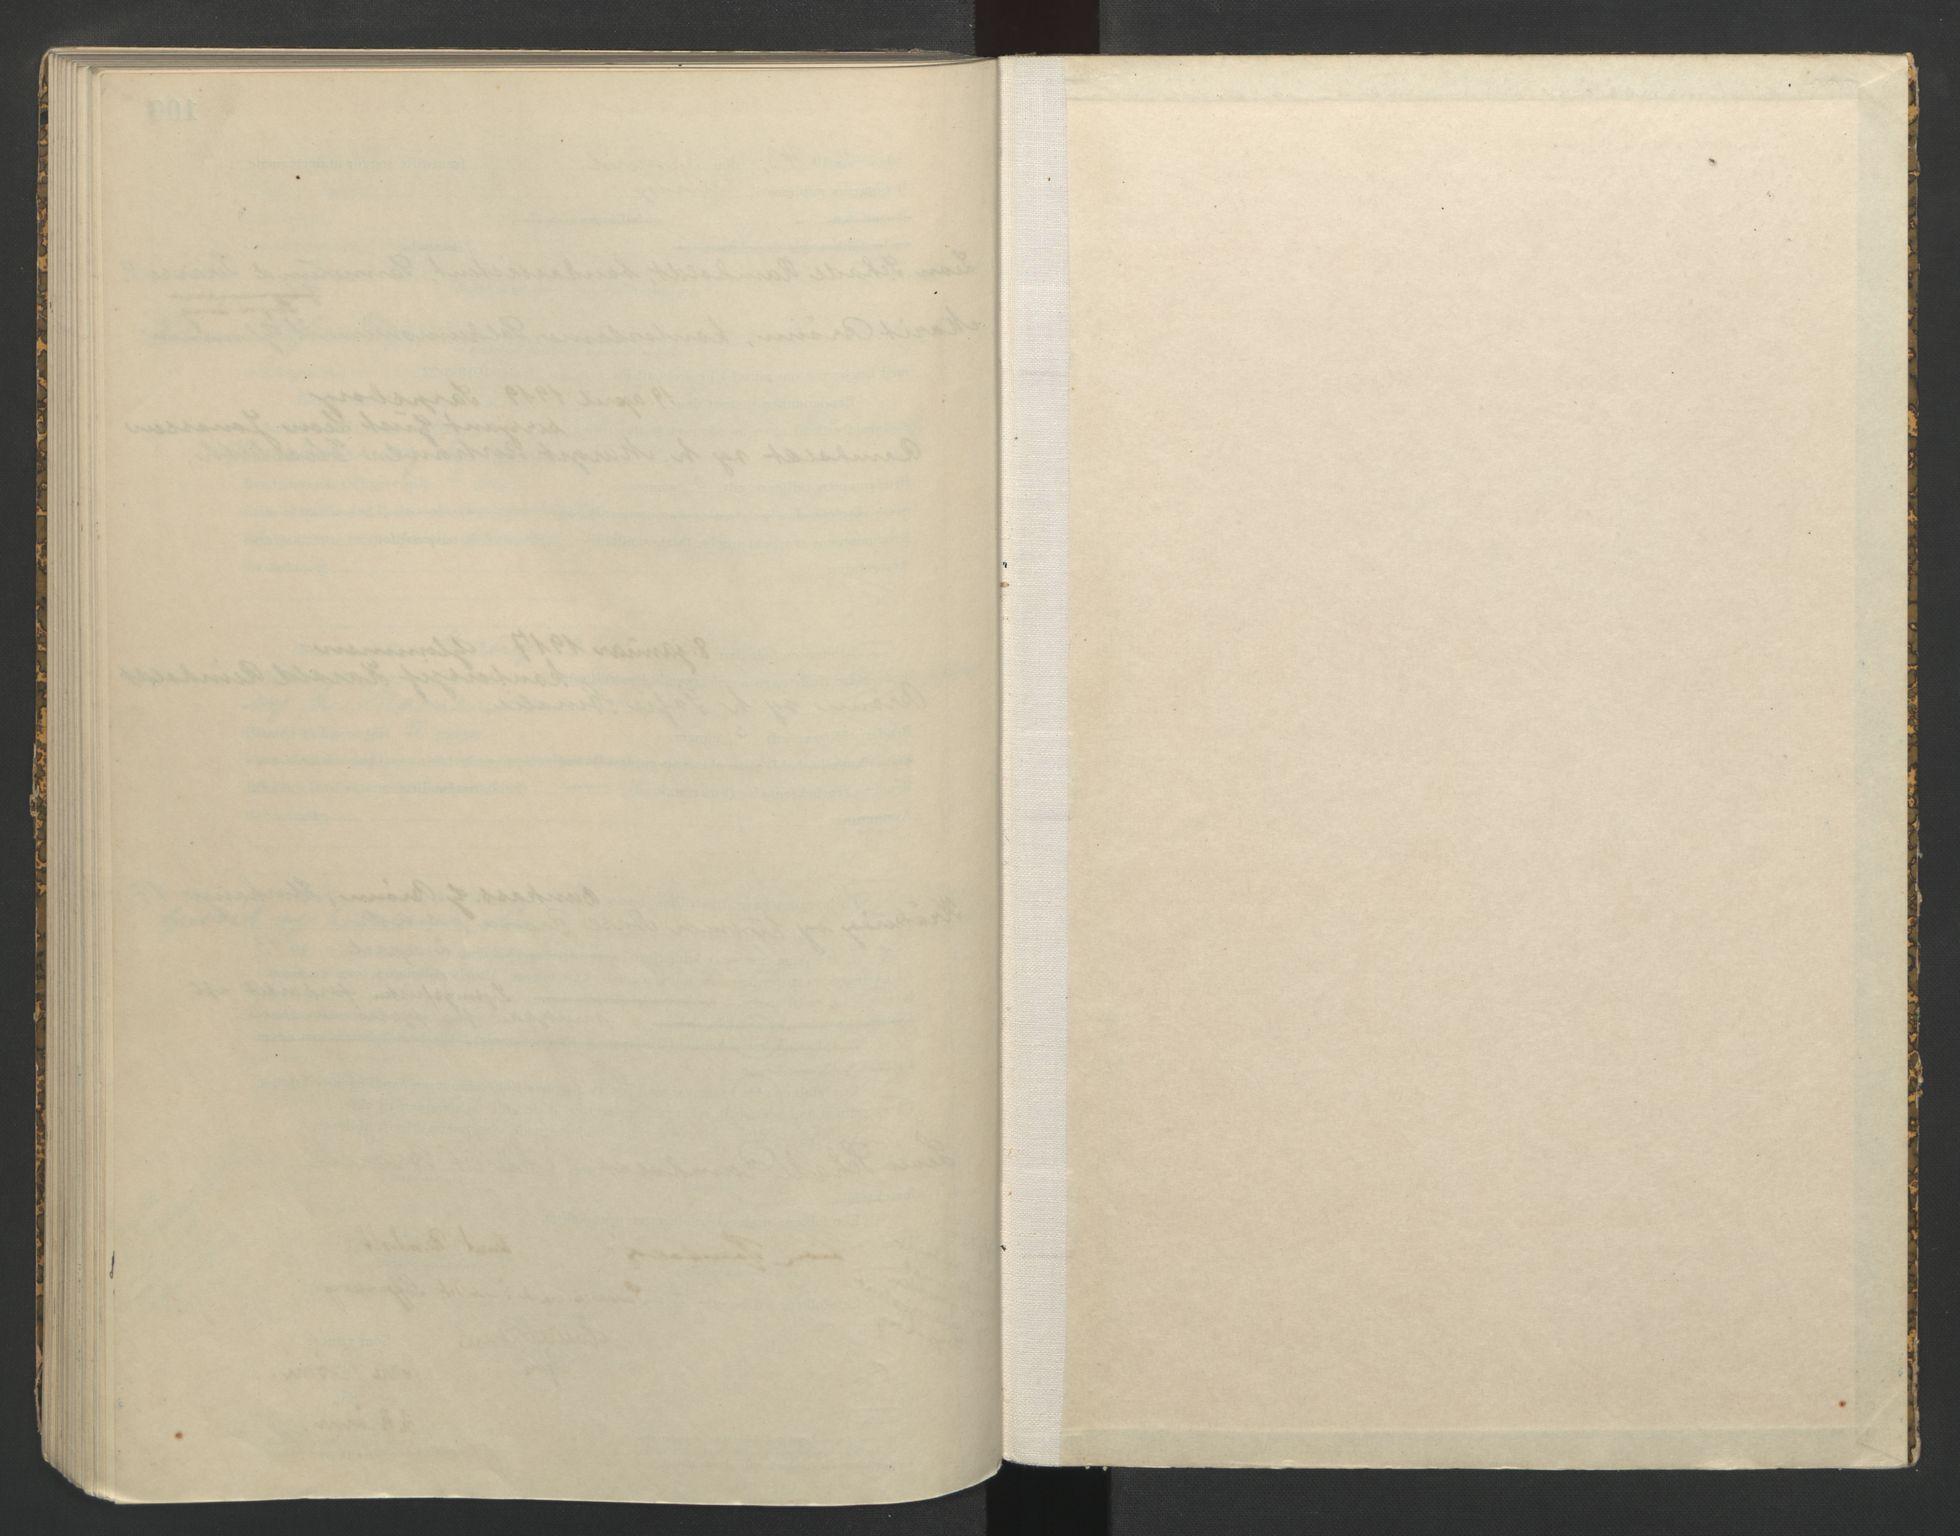 SAO, Onsøy sorenskriveri, L/La/L0002: Vigselsbok, 1942-1943, s. upaginert